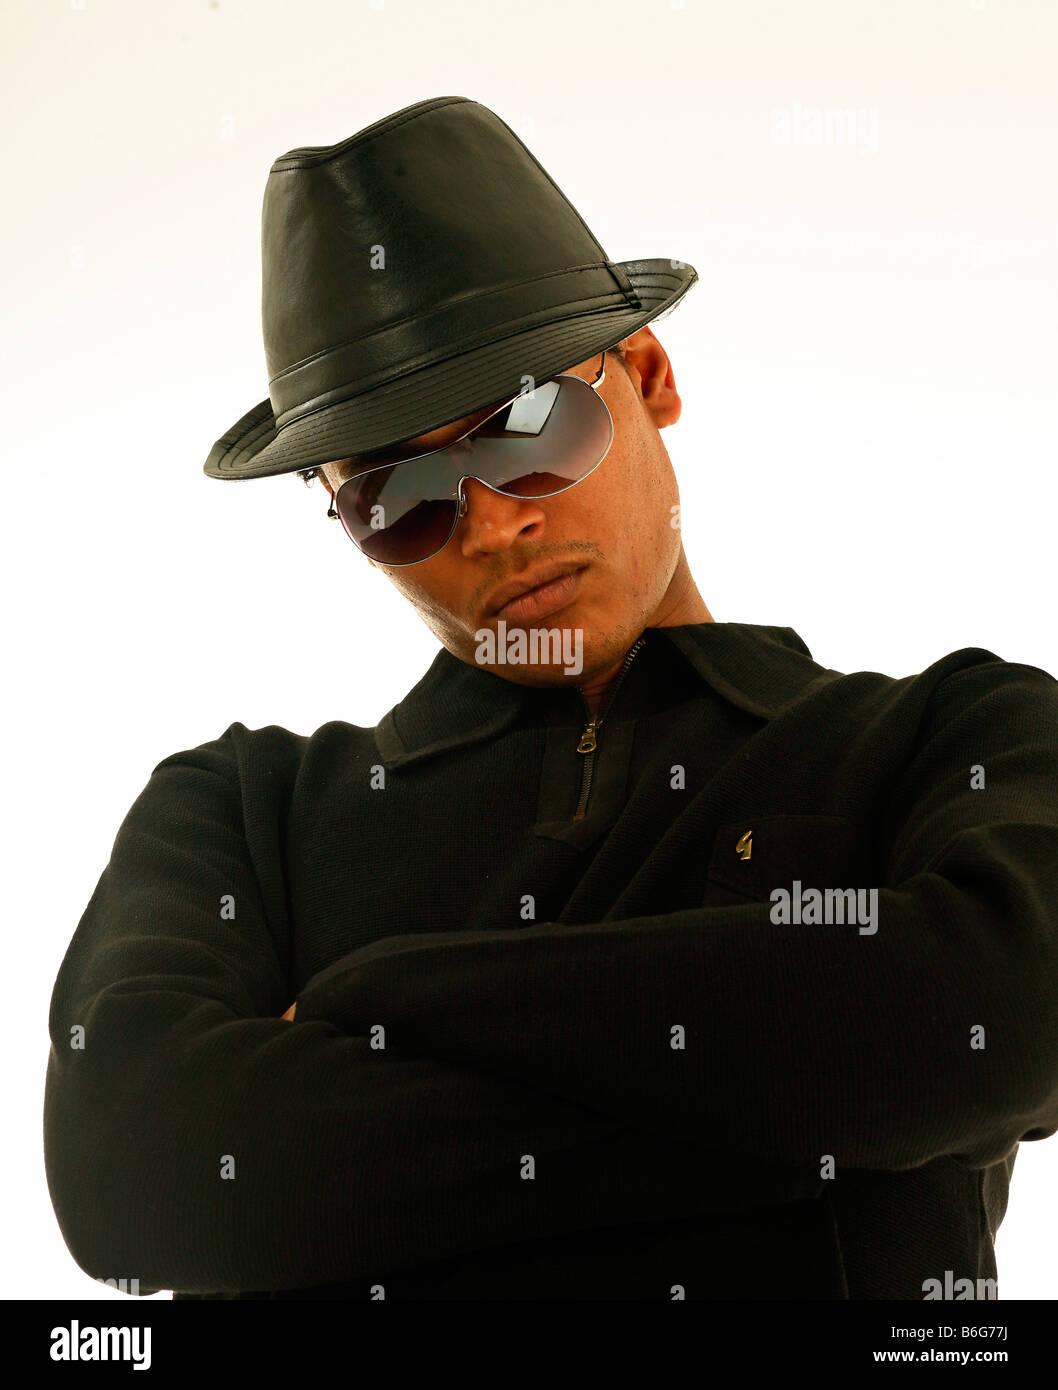 jimmy screech hip hop  musician singer writer uk  banana clan black rapper hat sun glasses Stock Photo